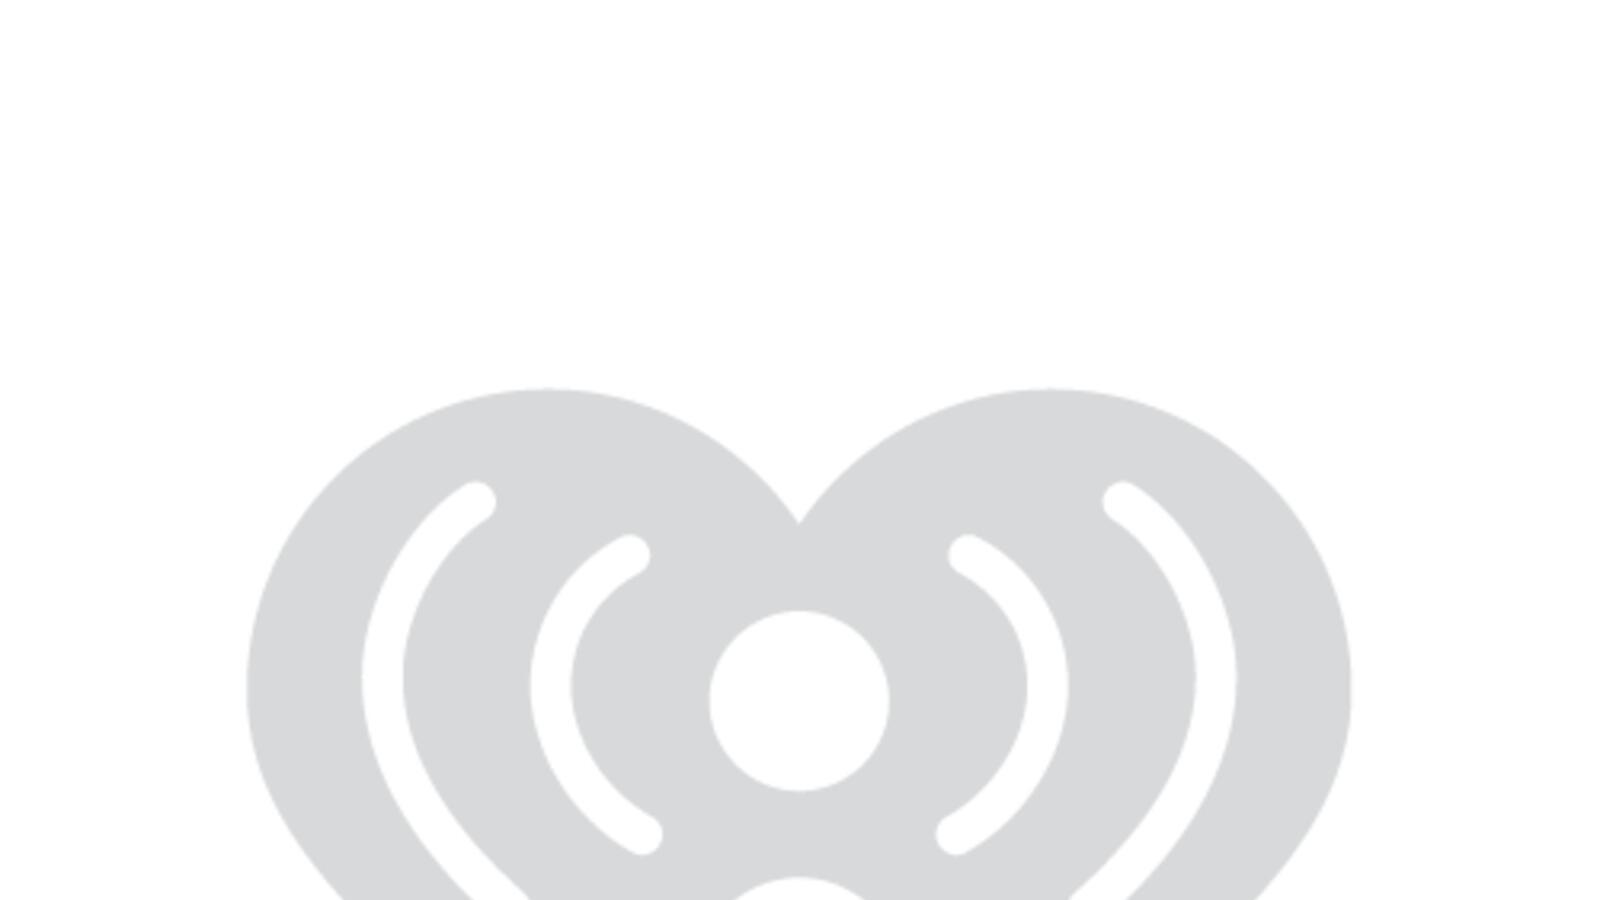 Vicki Greene (Pearson) on the impact of COVID on women's career paths